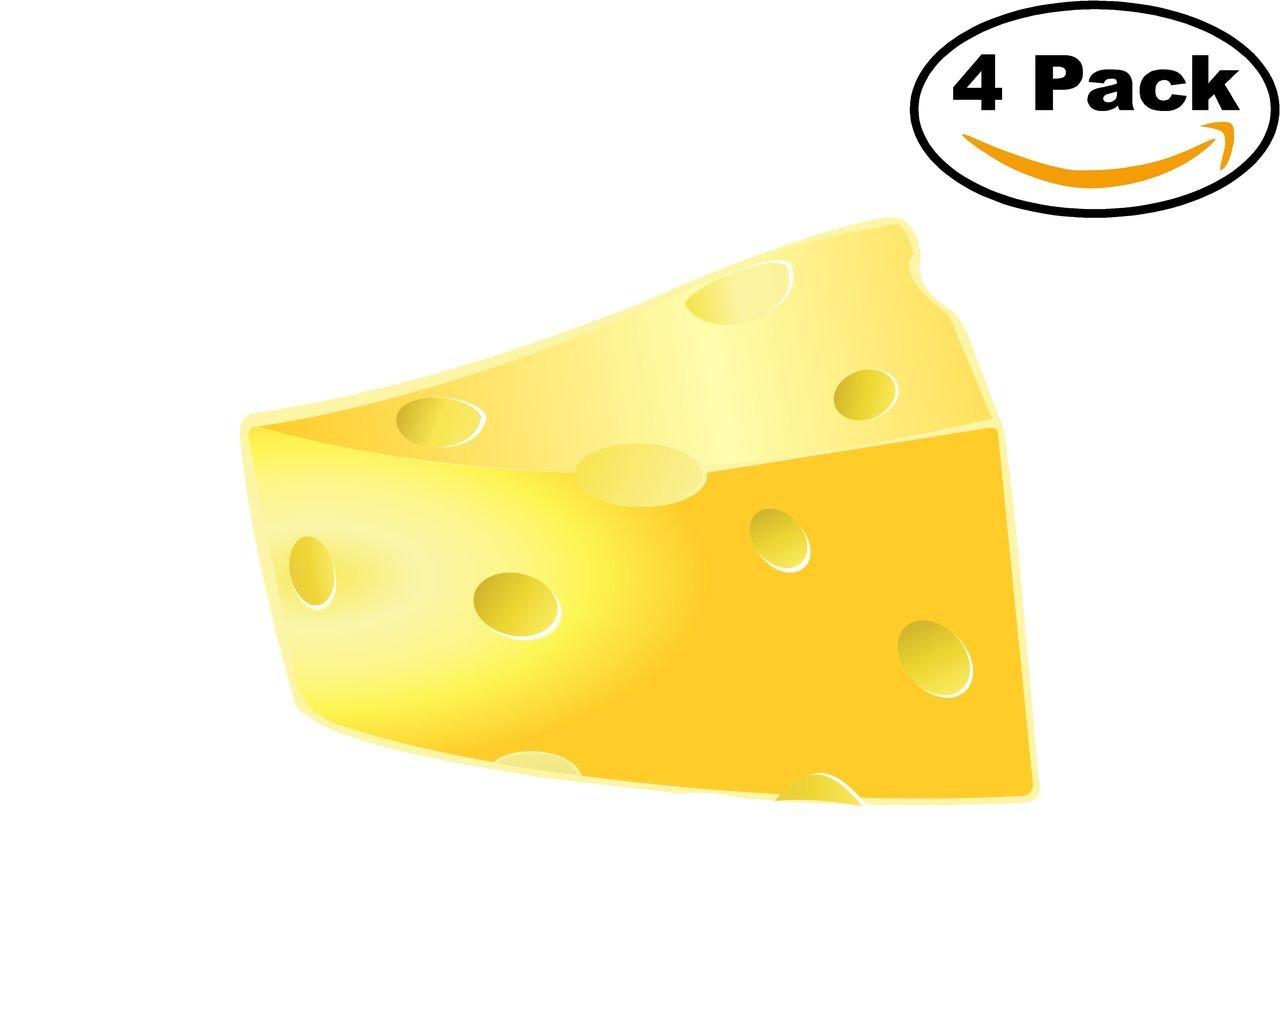 Amazon.com: Cheese 4 Stickers 4X4 Inches Car Bumper Window Sticker Decal 54